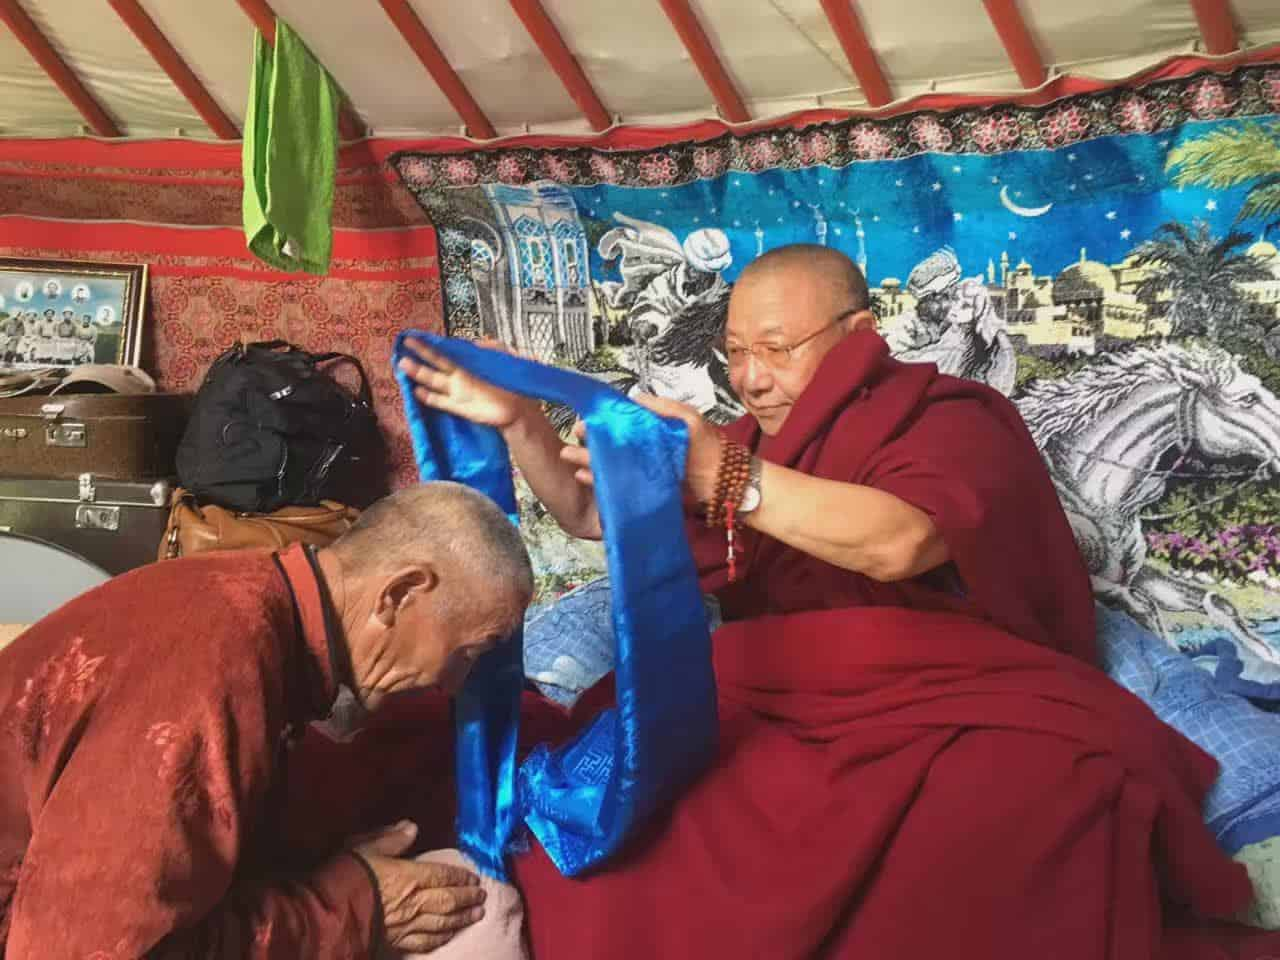 gosok-rinpoche-mongolia-2016-4b65be9074efbc10825b2c679a79fe5